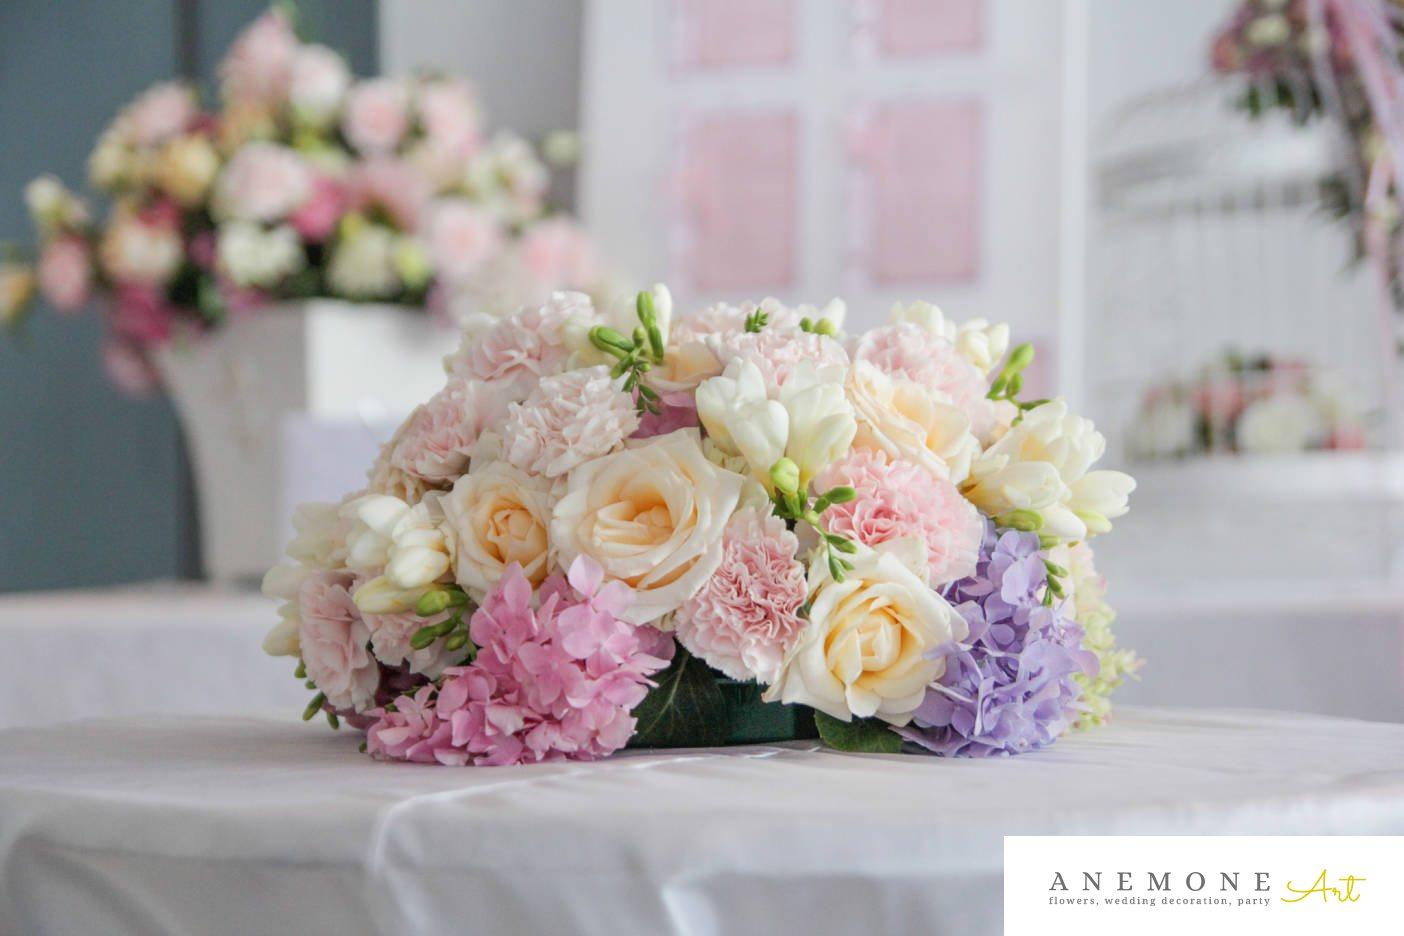 Poza, foto cu Flori de nunta alb, decor masa, frezii, garoafe, hortensia, mov, roz in Arad, Timisoara, Oradea (wedding flowers, bouquets) nunta Arad, Timisoara, Oradea